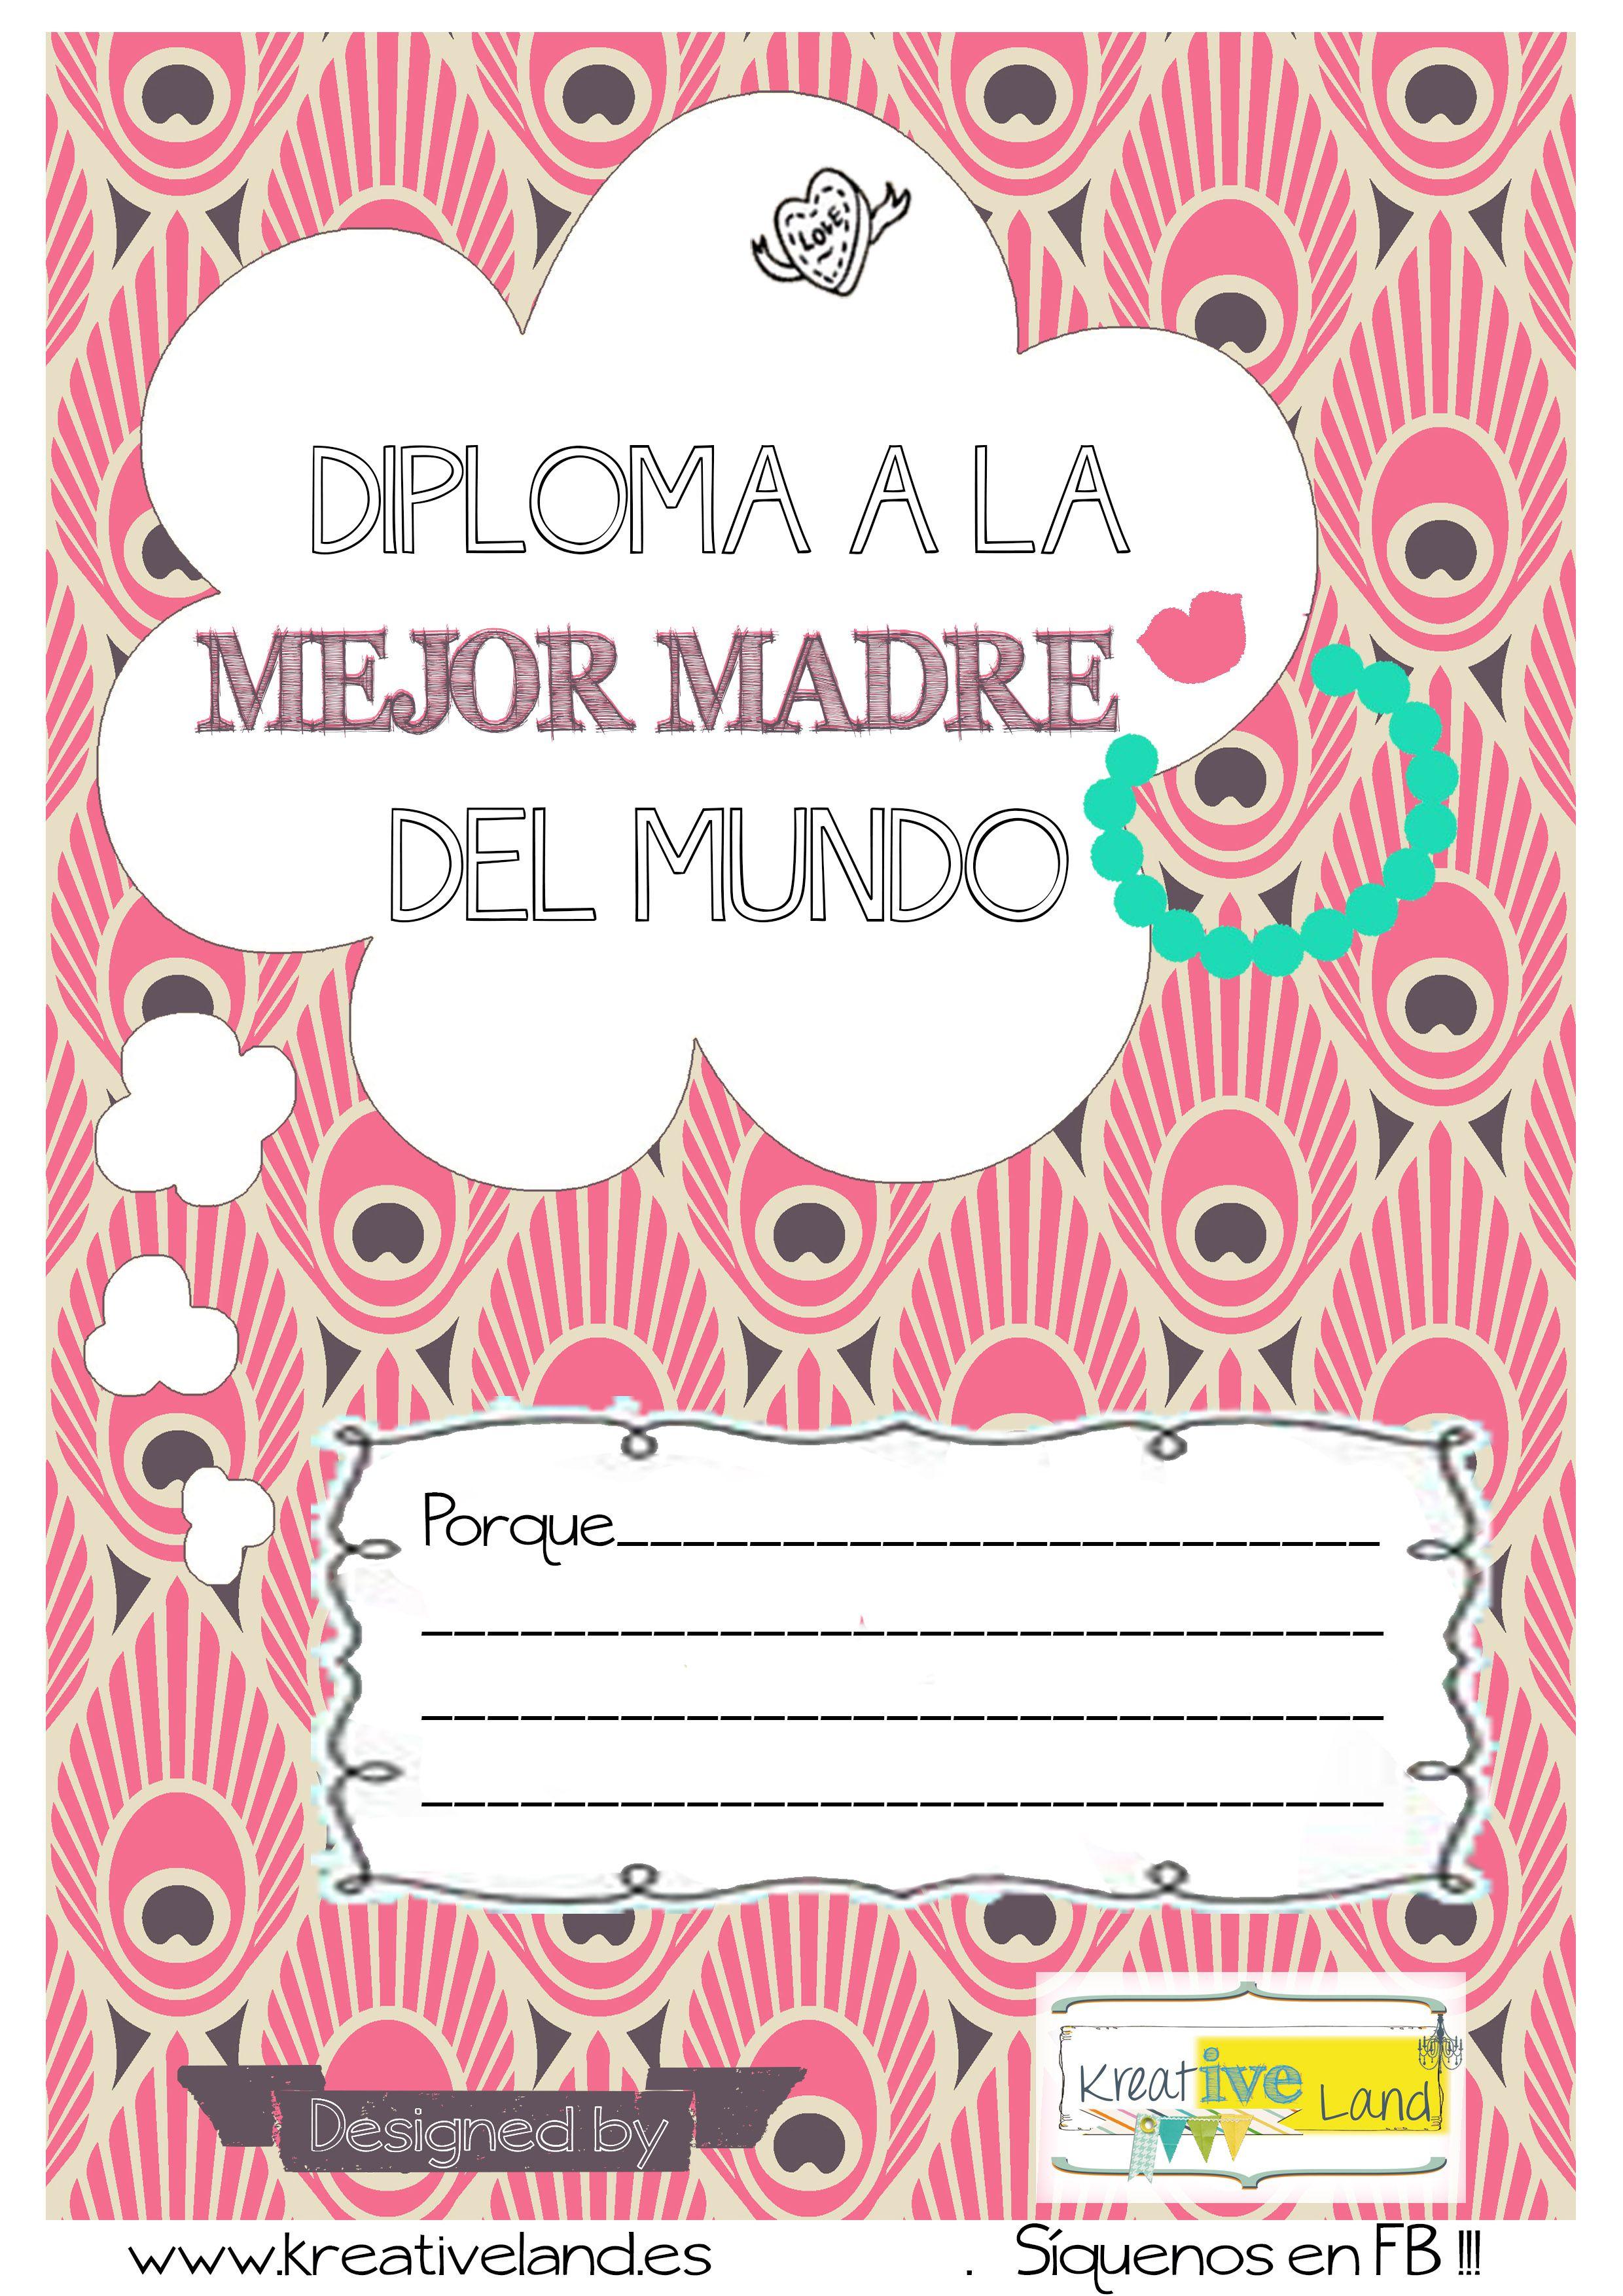 Diploma mejor madre del mundo gratis para imprimir | gif | Pinterest ...